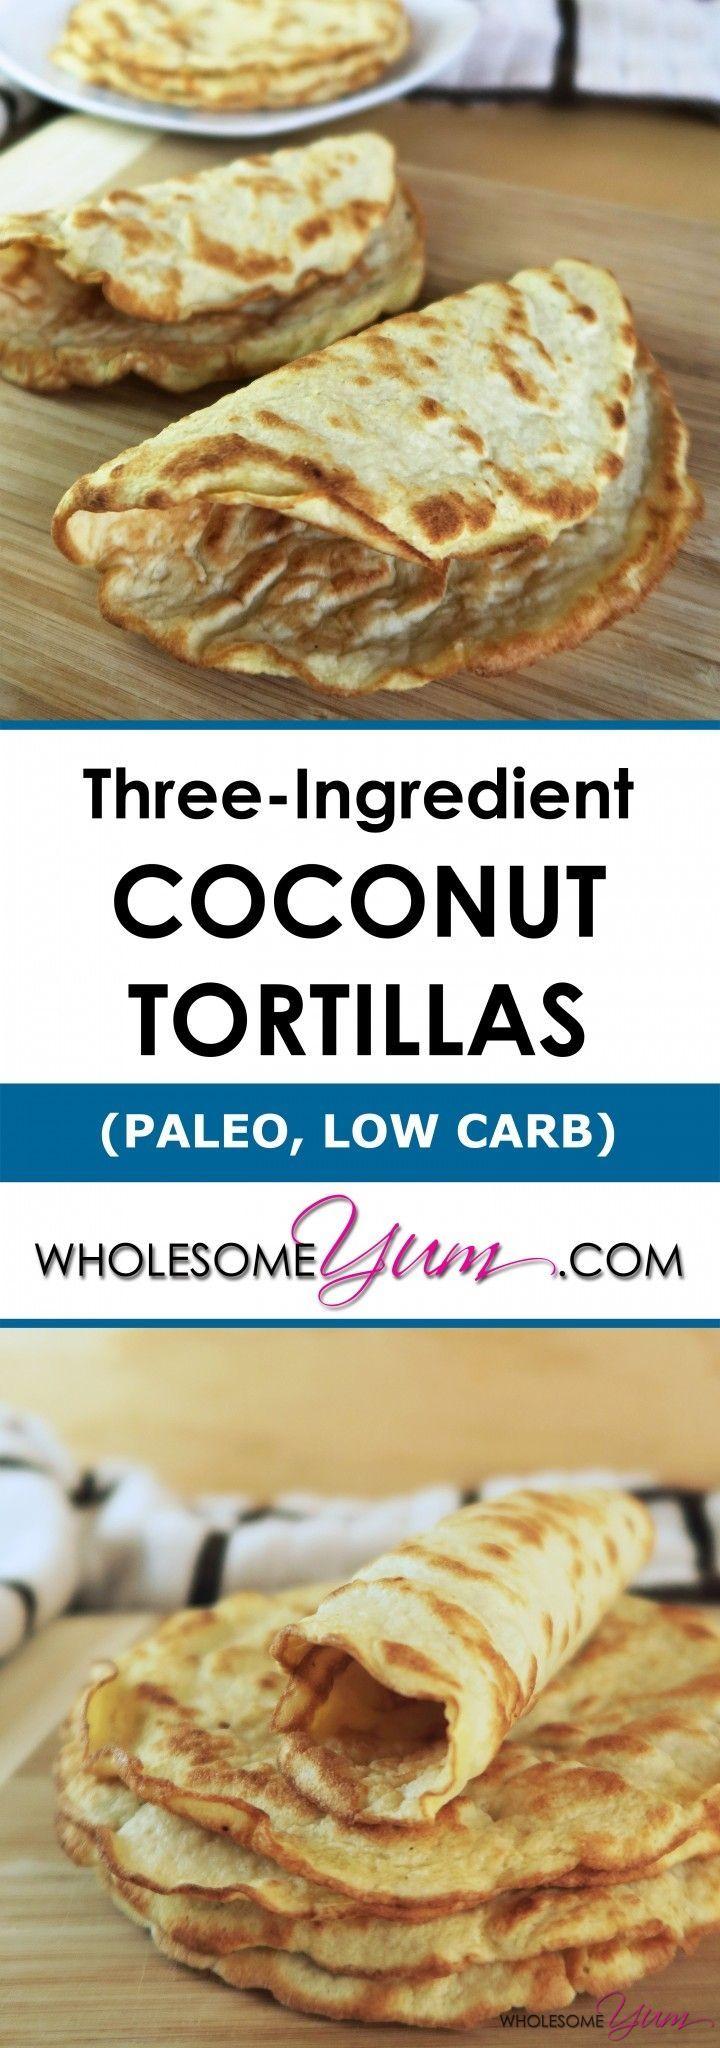 3-Ingredient Coconut Tortillas (Paleo, Low Carb)   2 NET CARBS